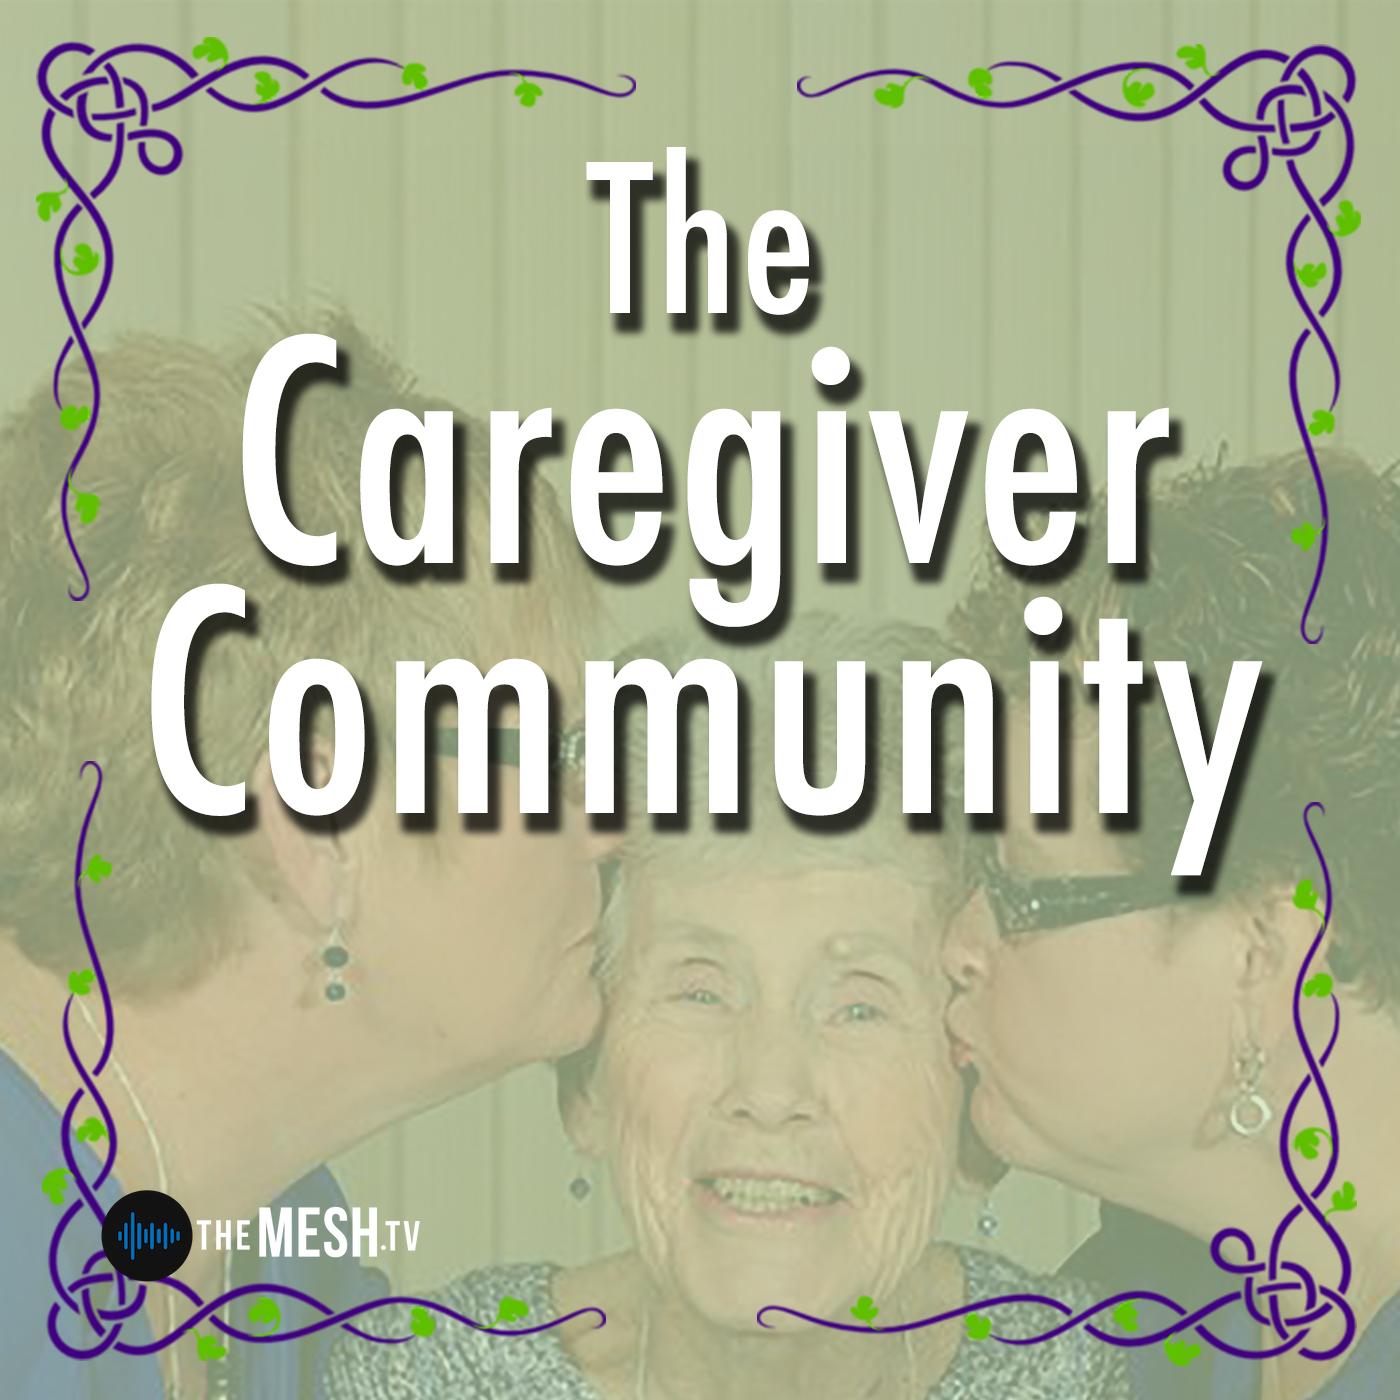 The Caregiver Community